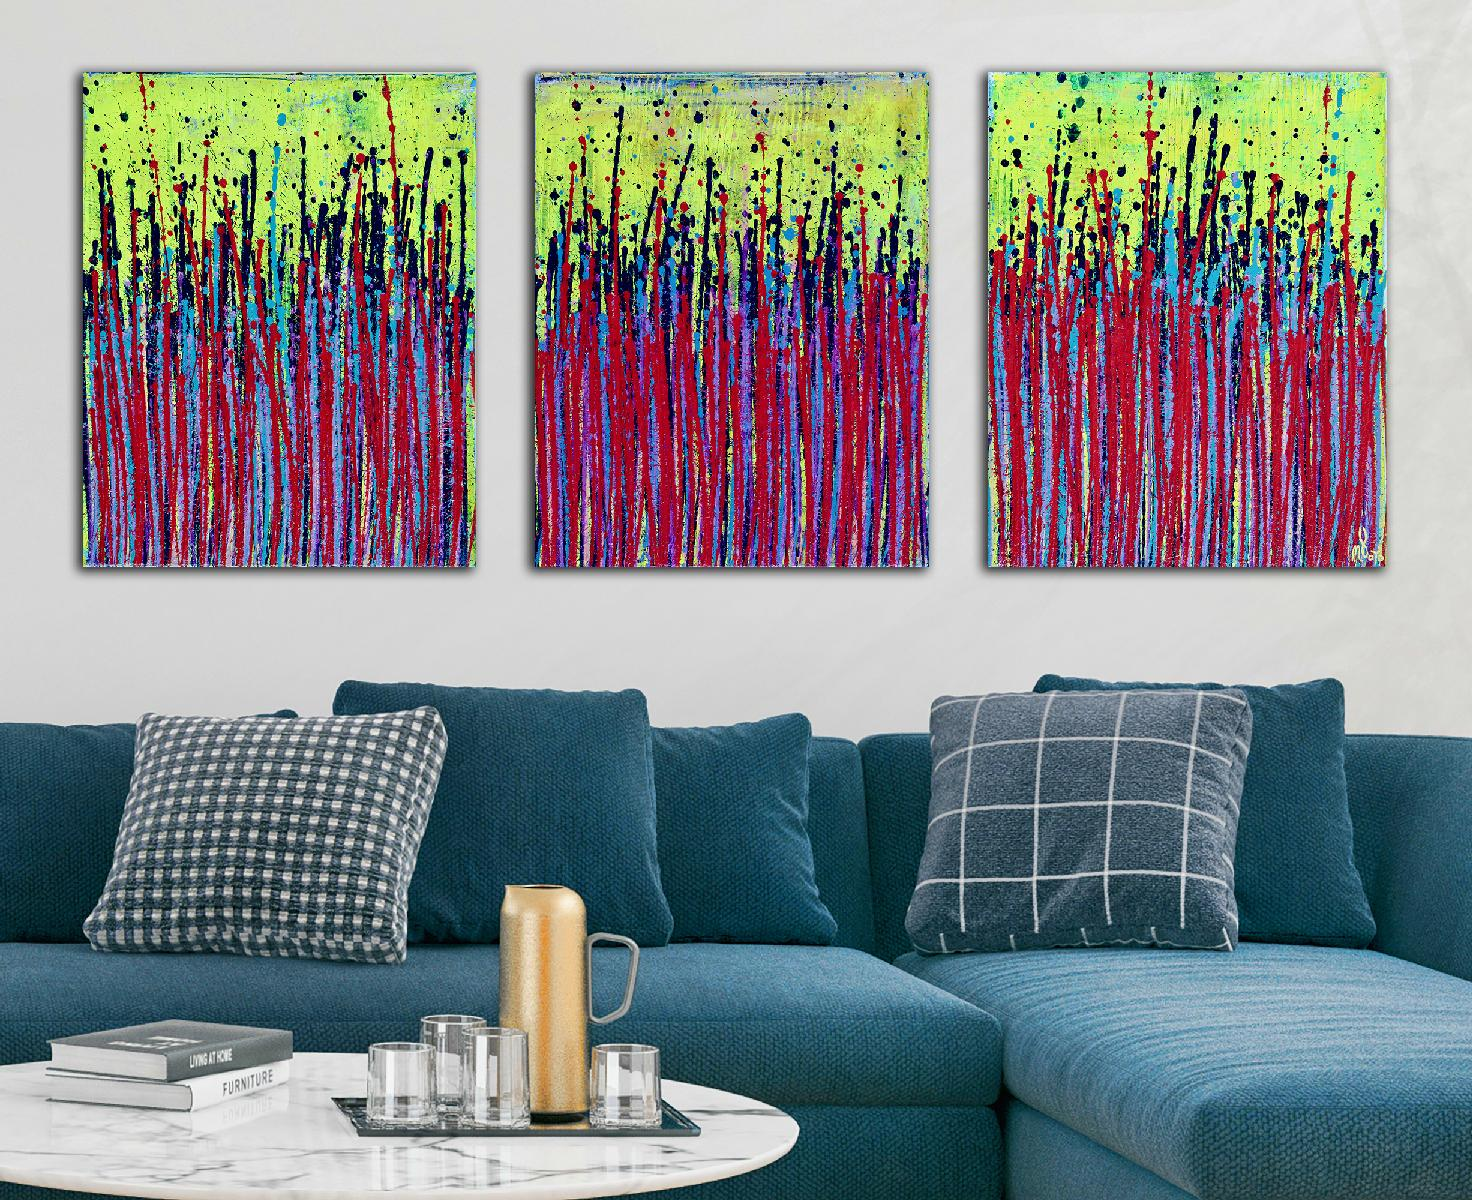 Room View - Interrupted odyssey (2020) Triptych by Nestor Toro